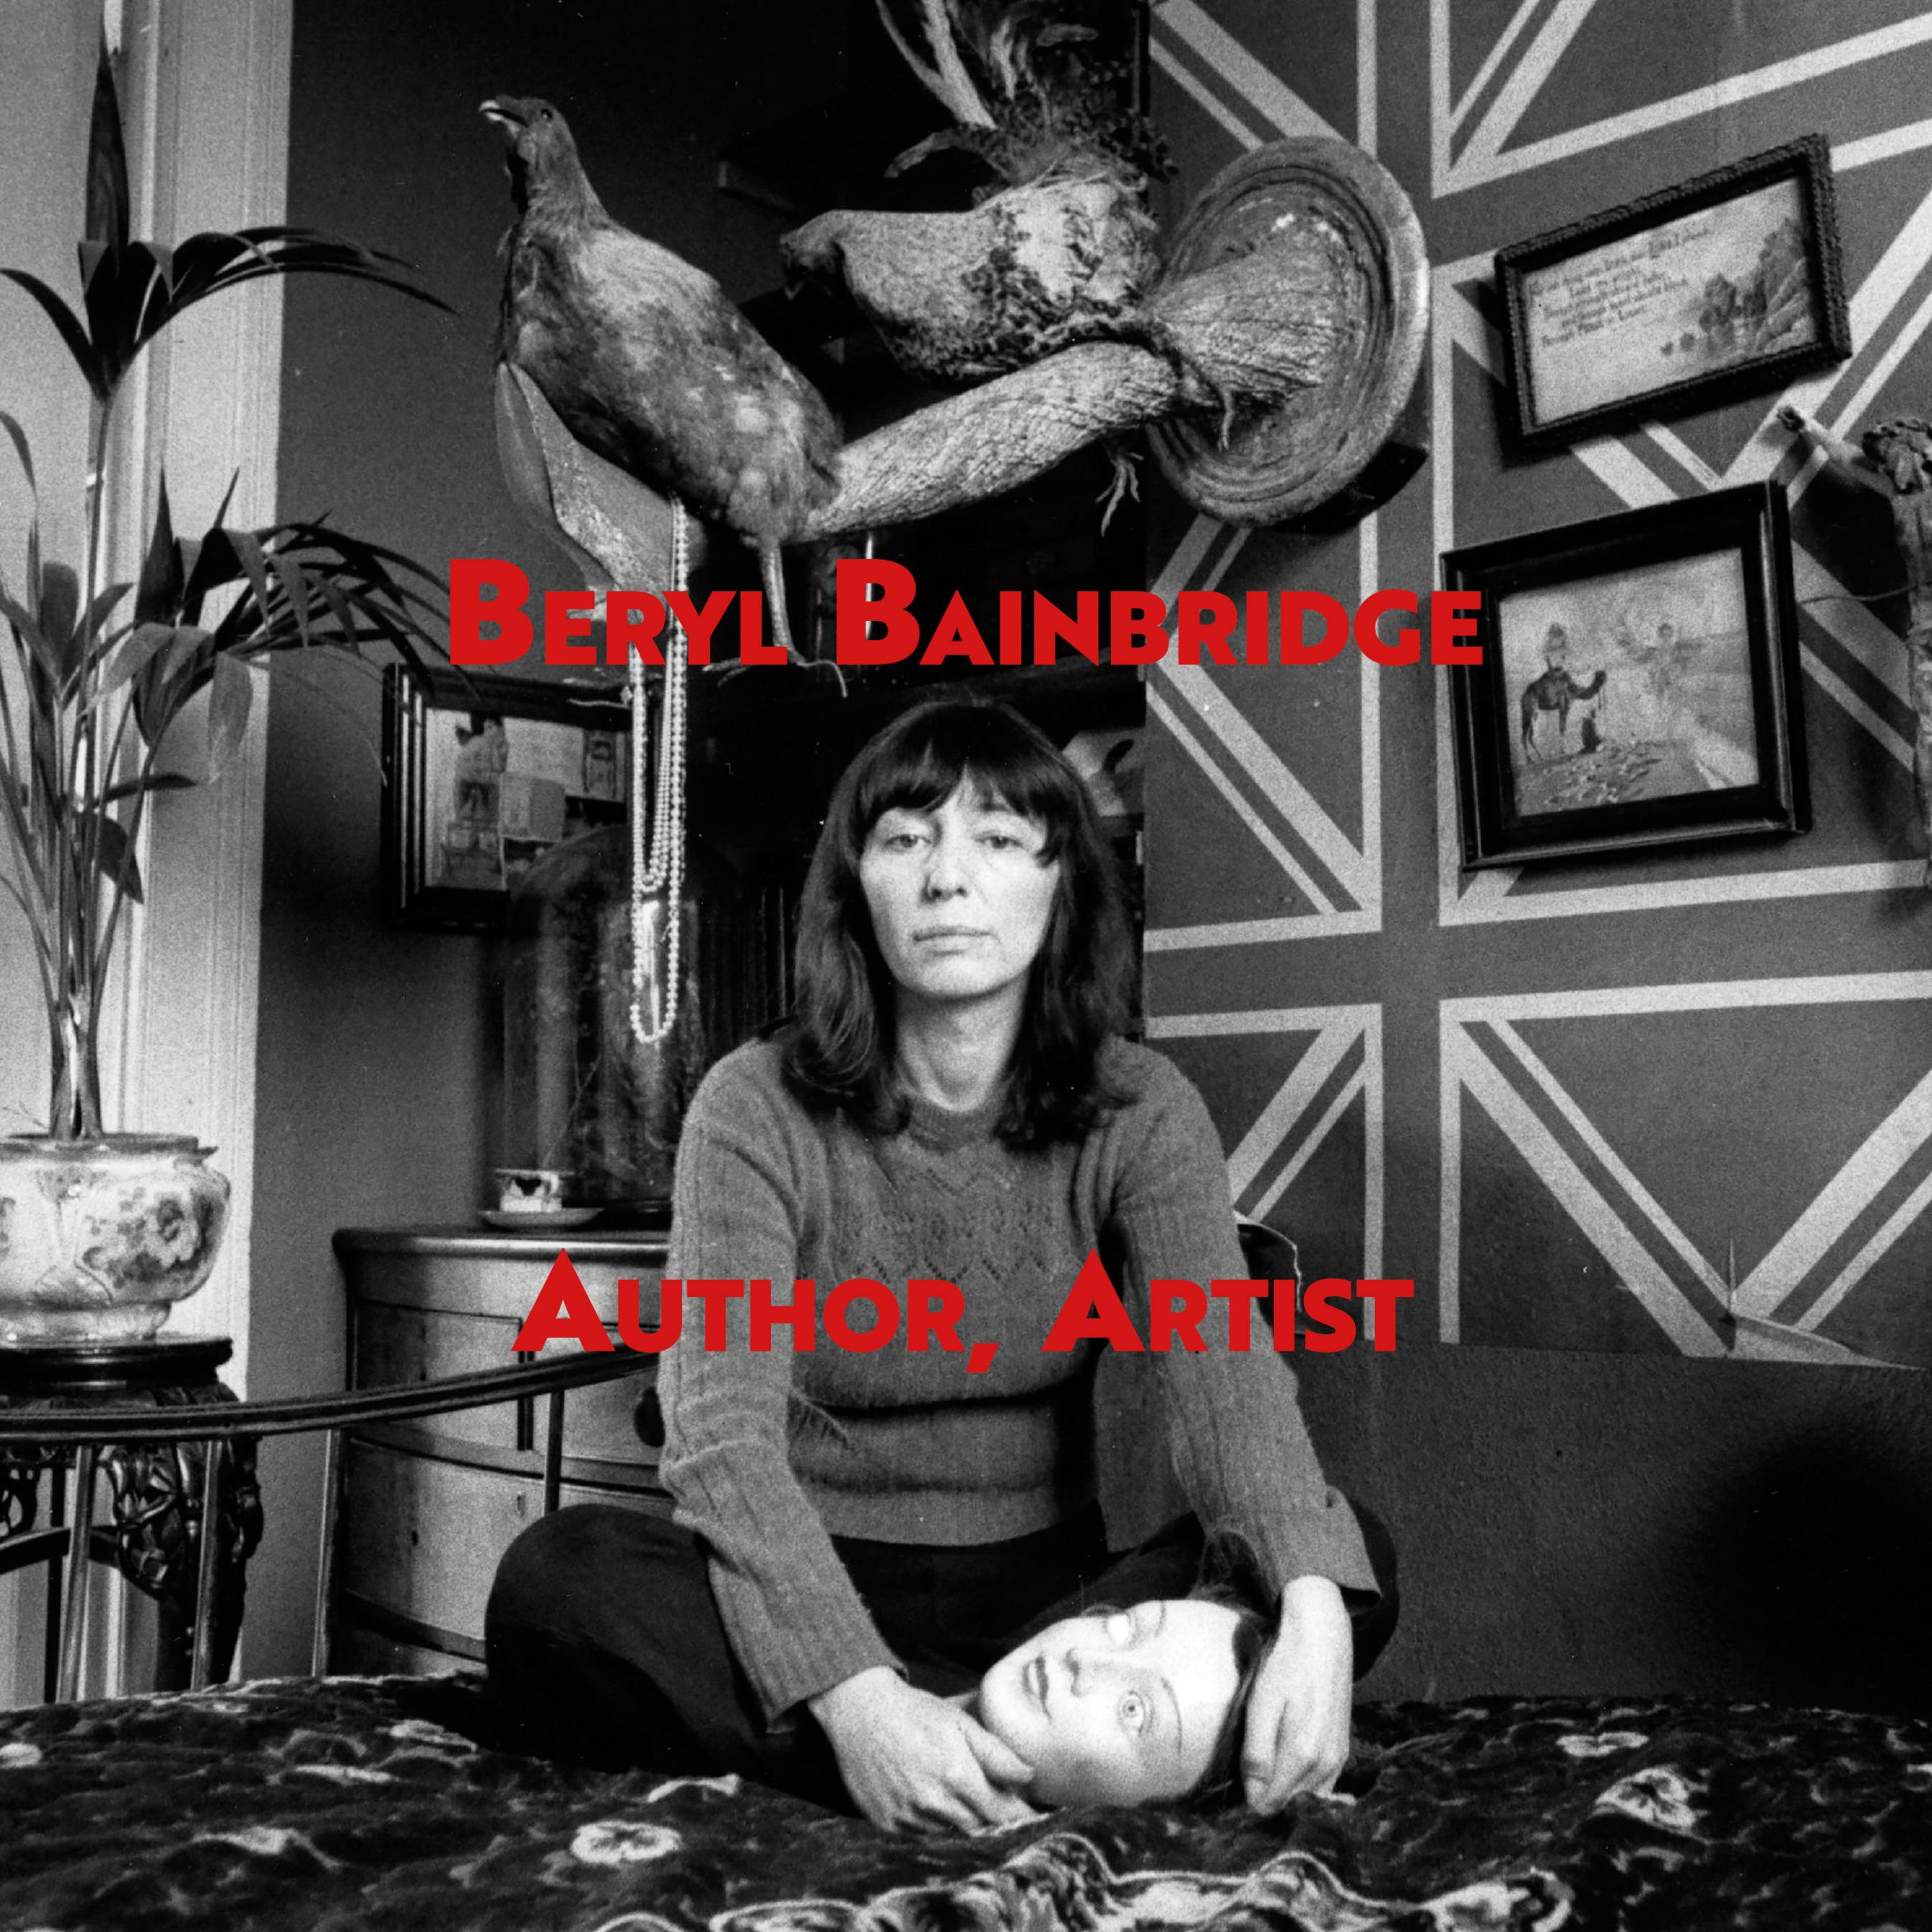 Beryl Bainbridge: Author, Artist